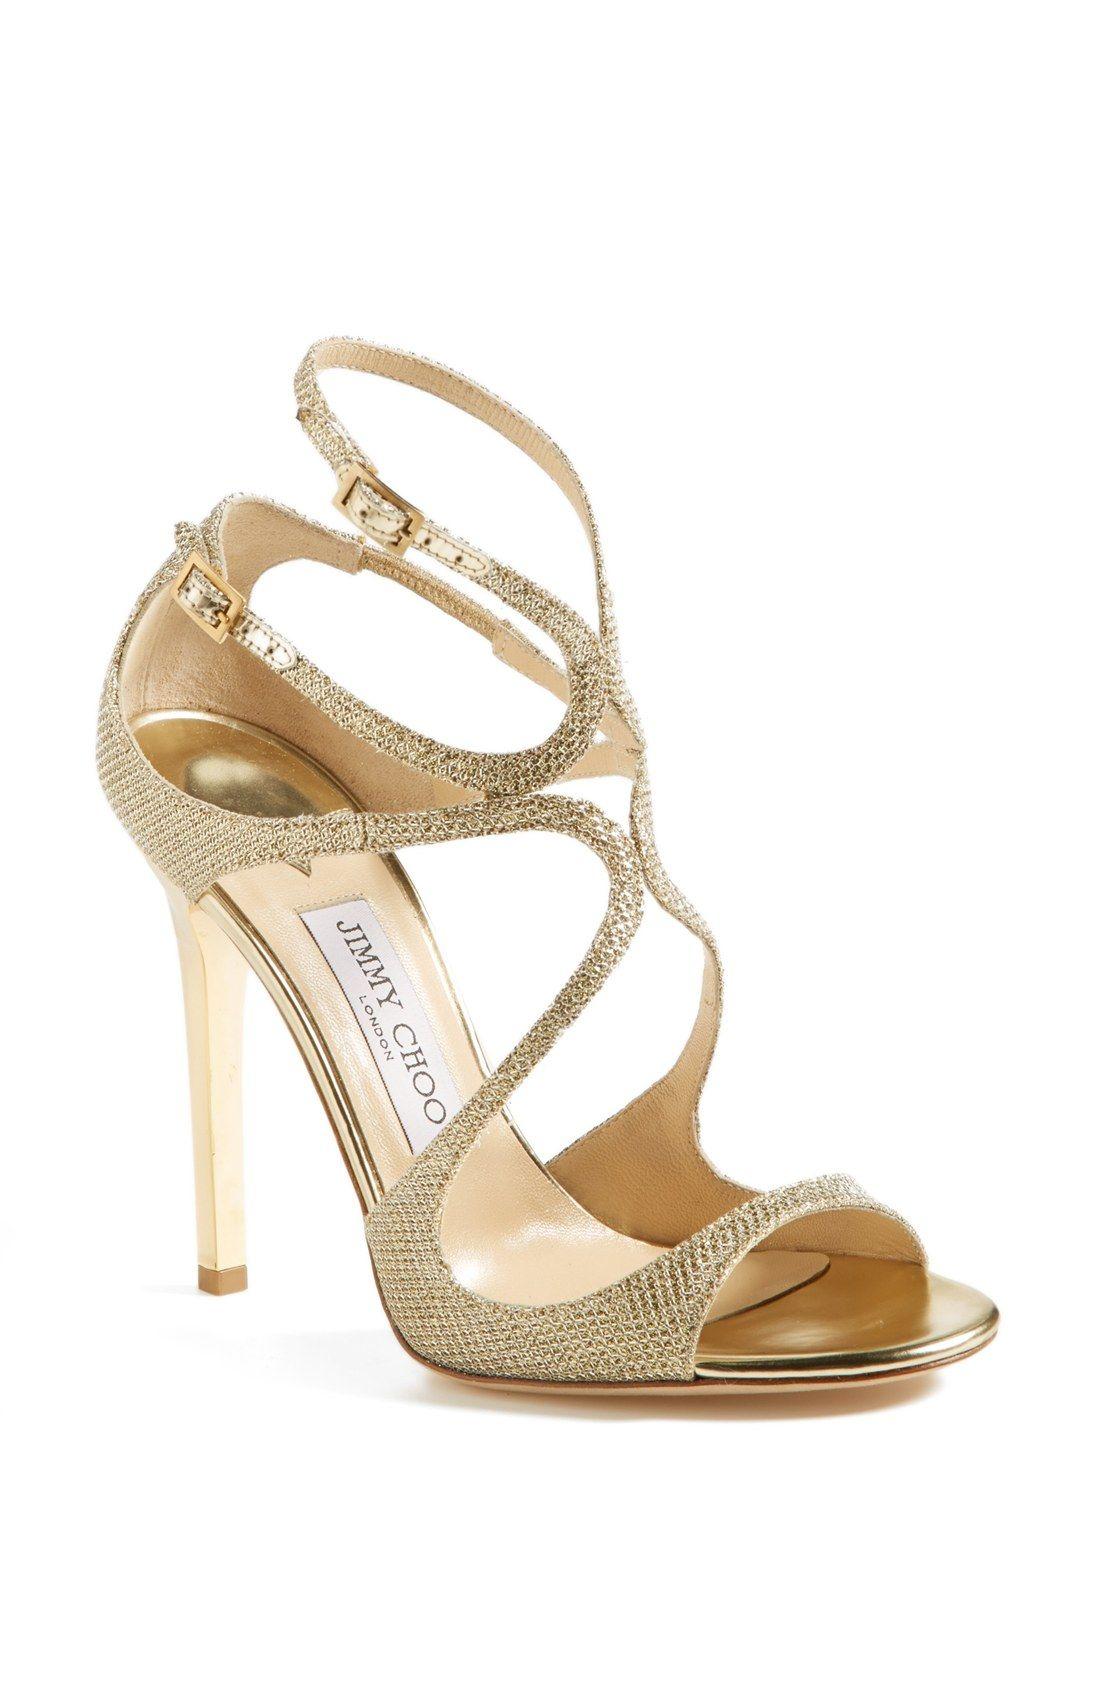 Jimmy choo heels, Jimmy choo sandals, Heels